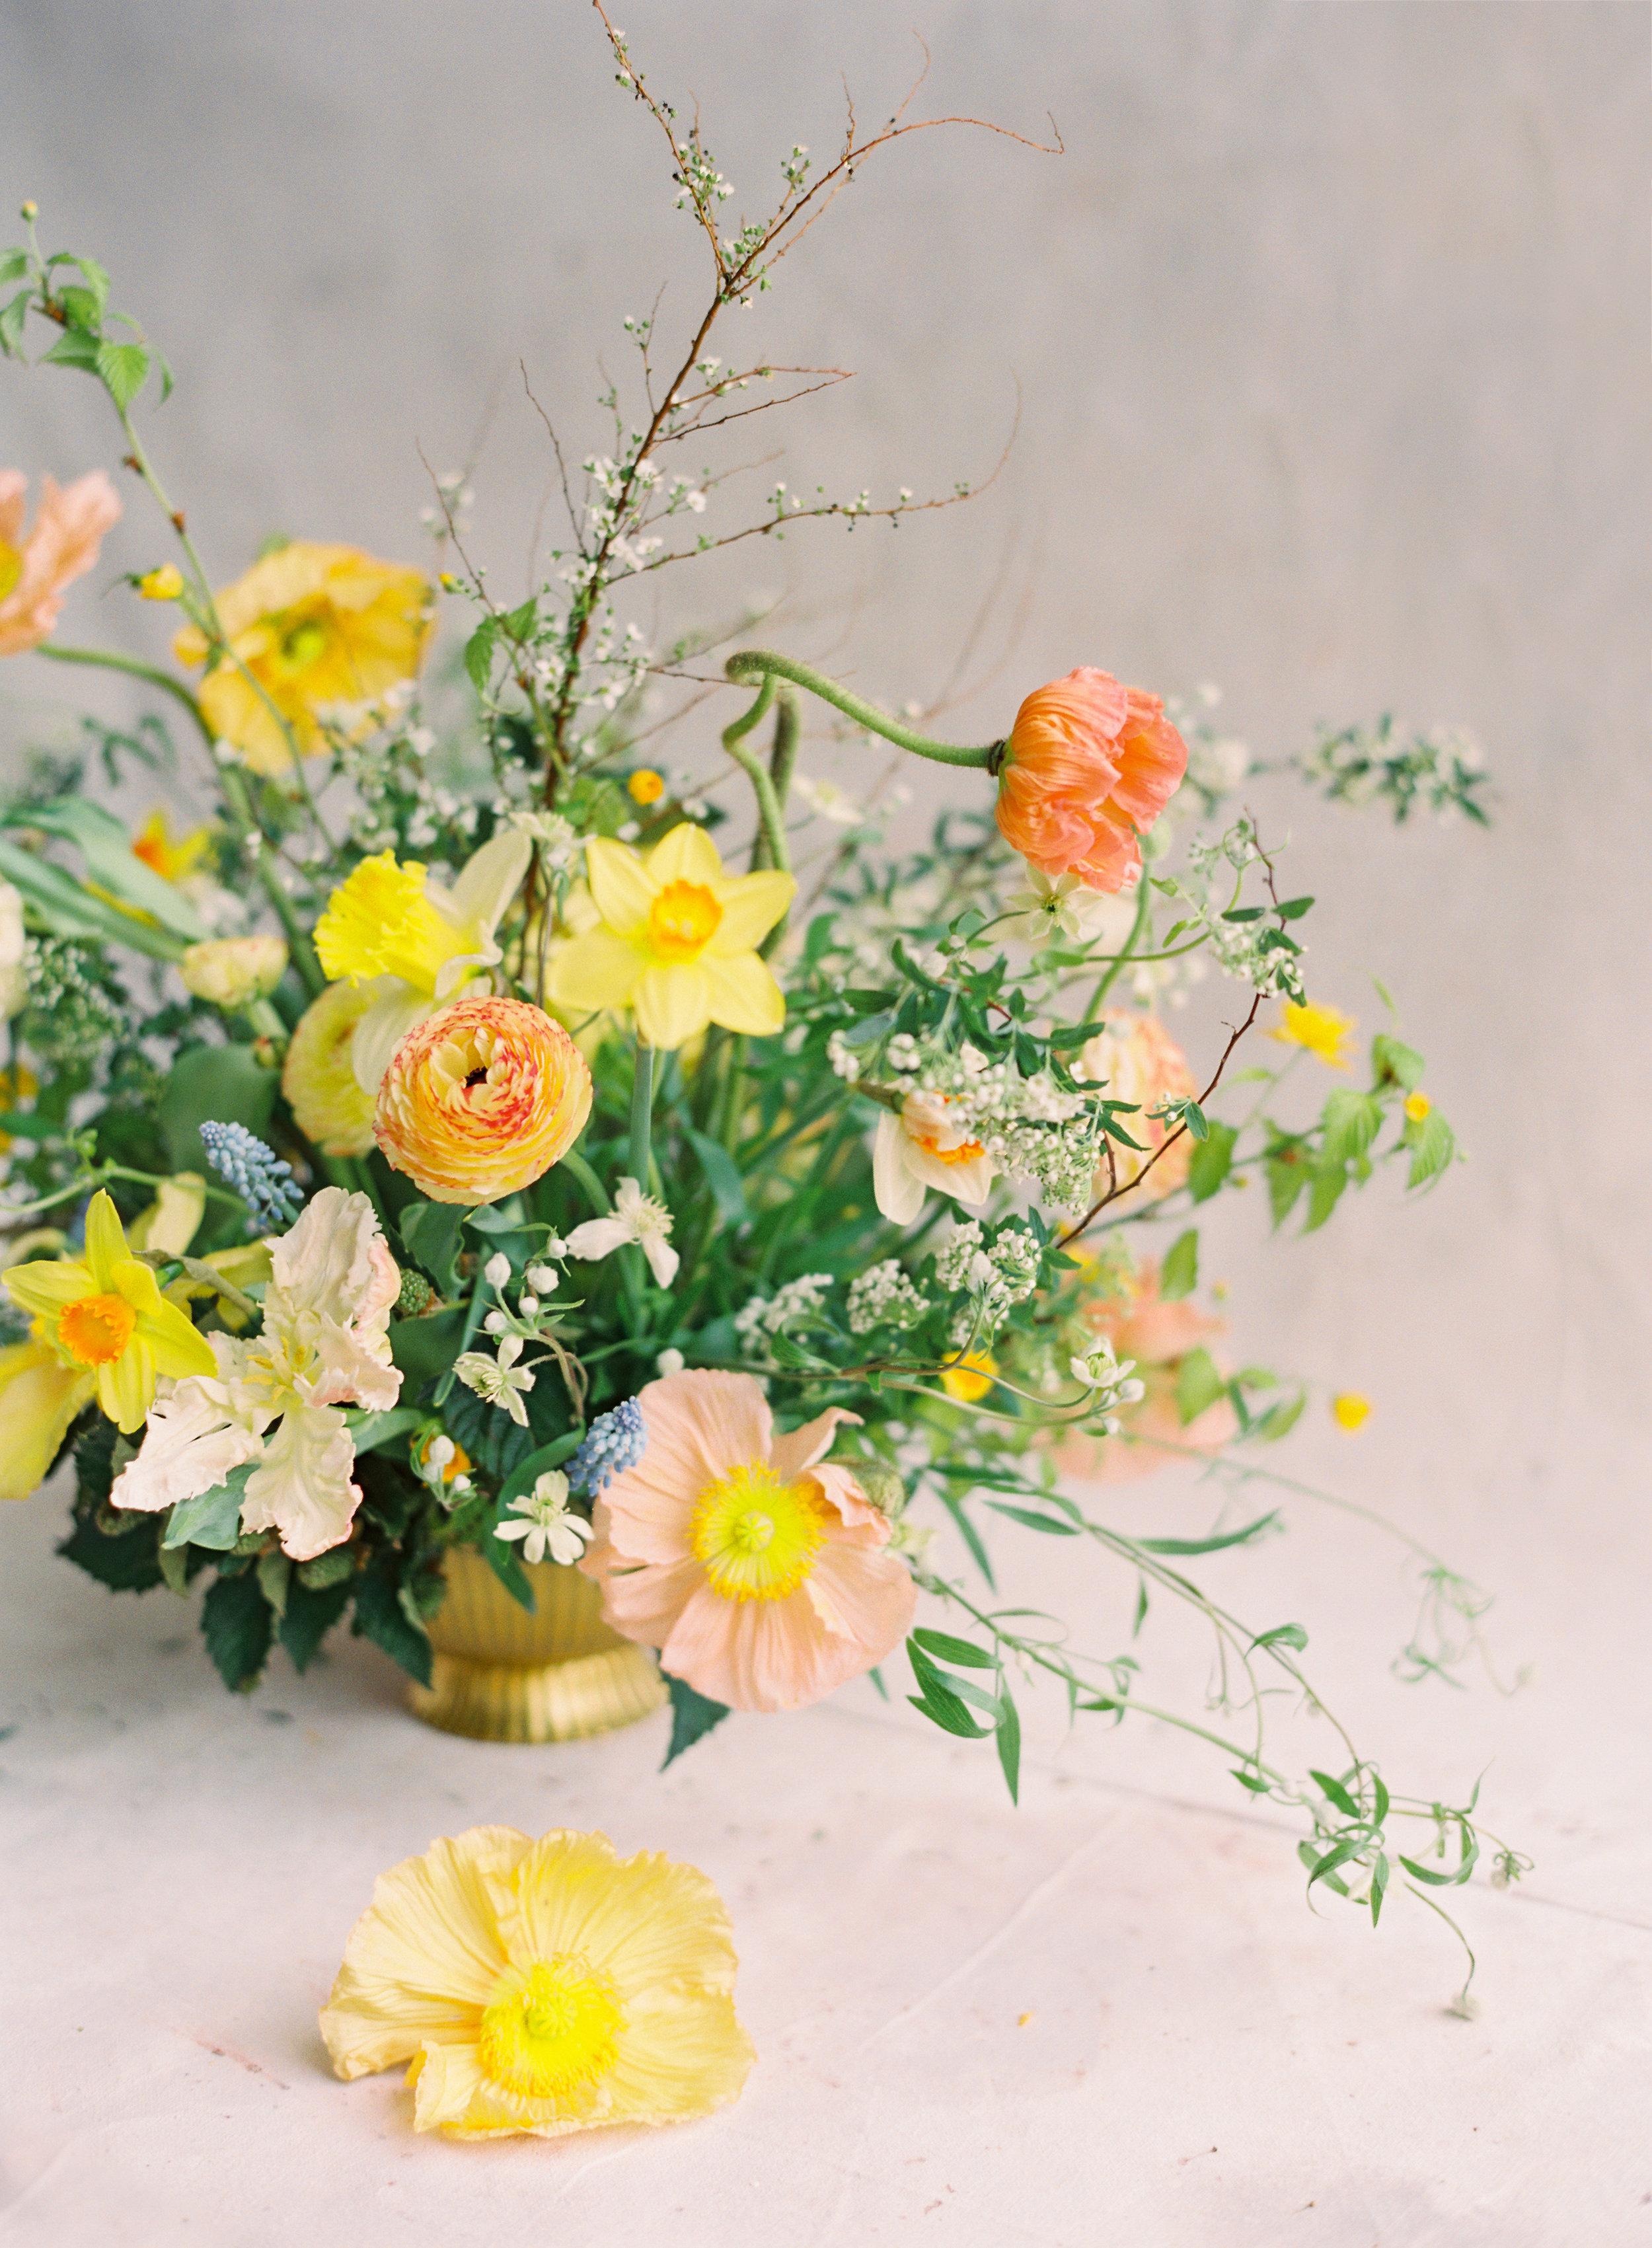 the-floral-society-spring-2018-85-Jen_Huang-002126-R1-002.jpg